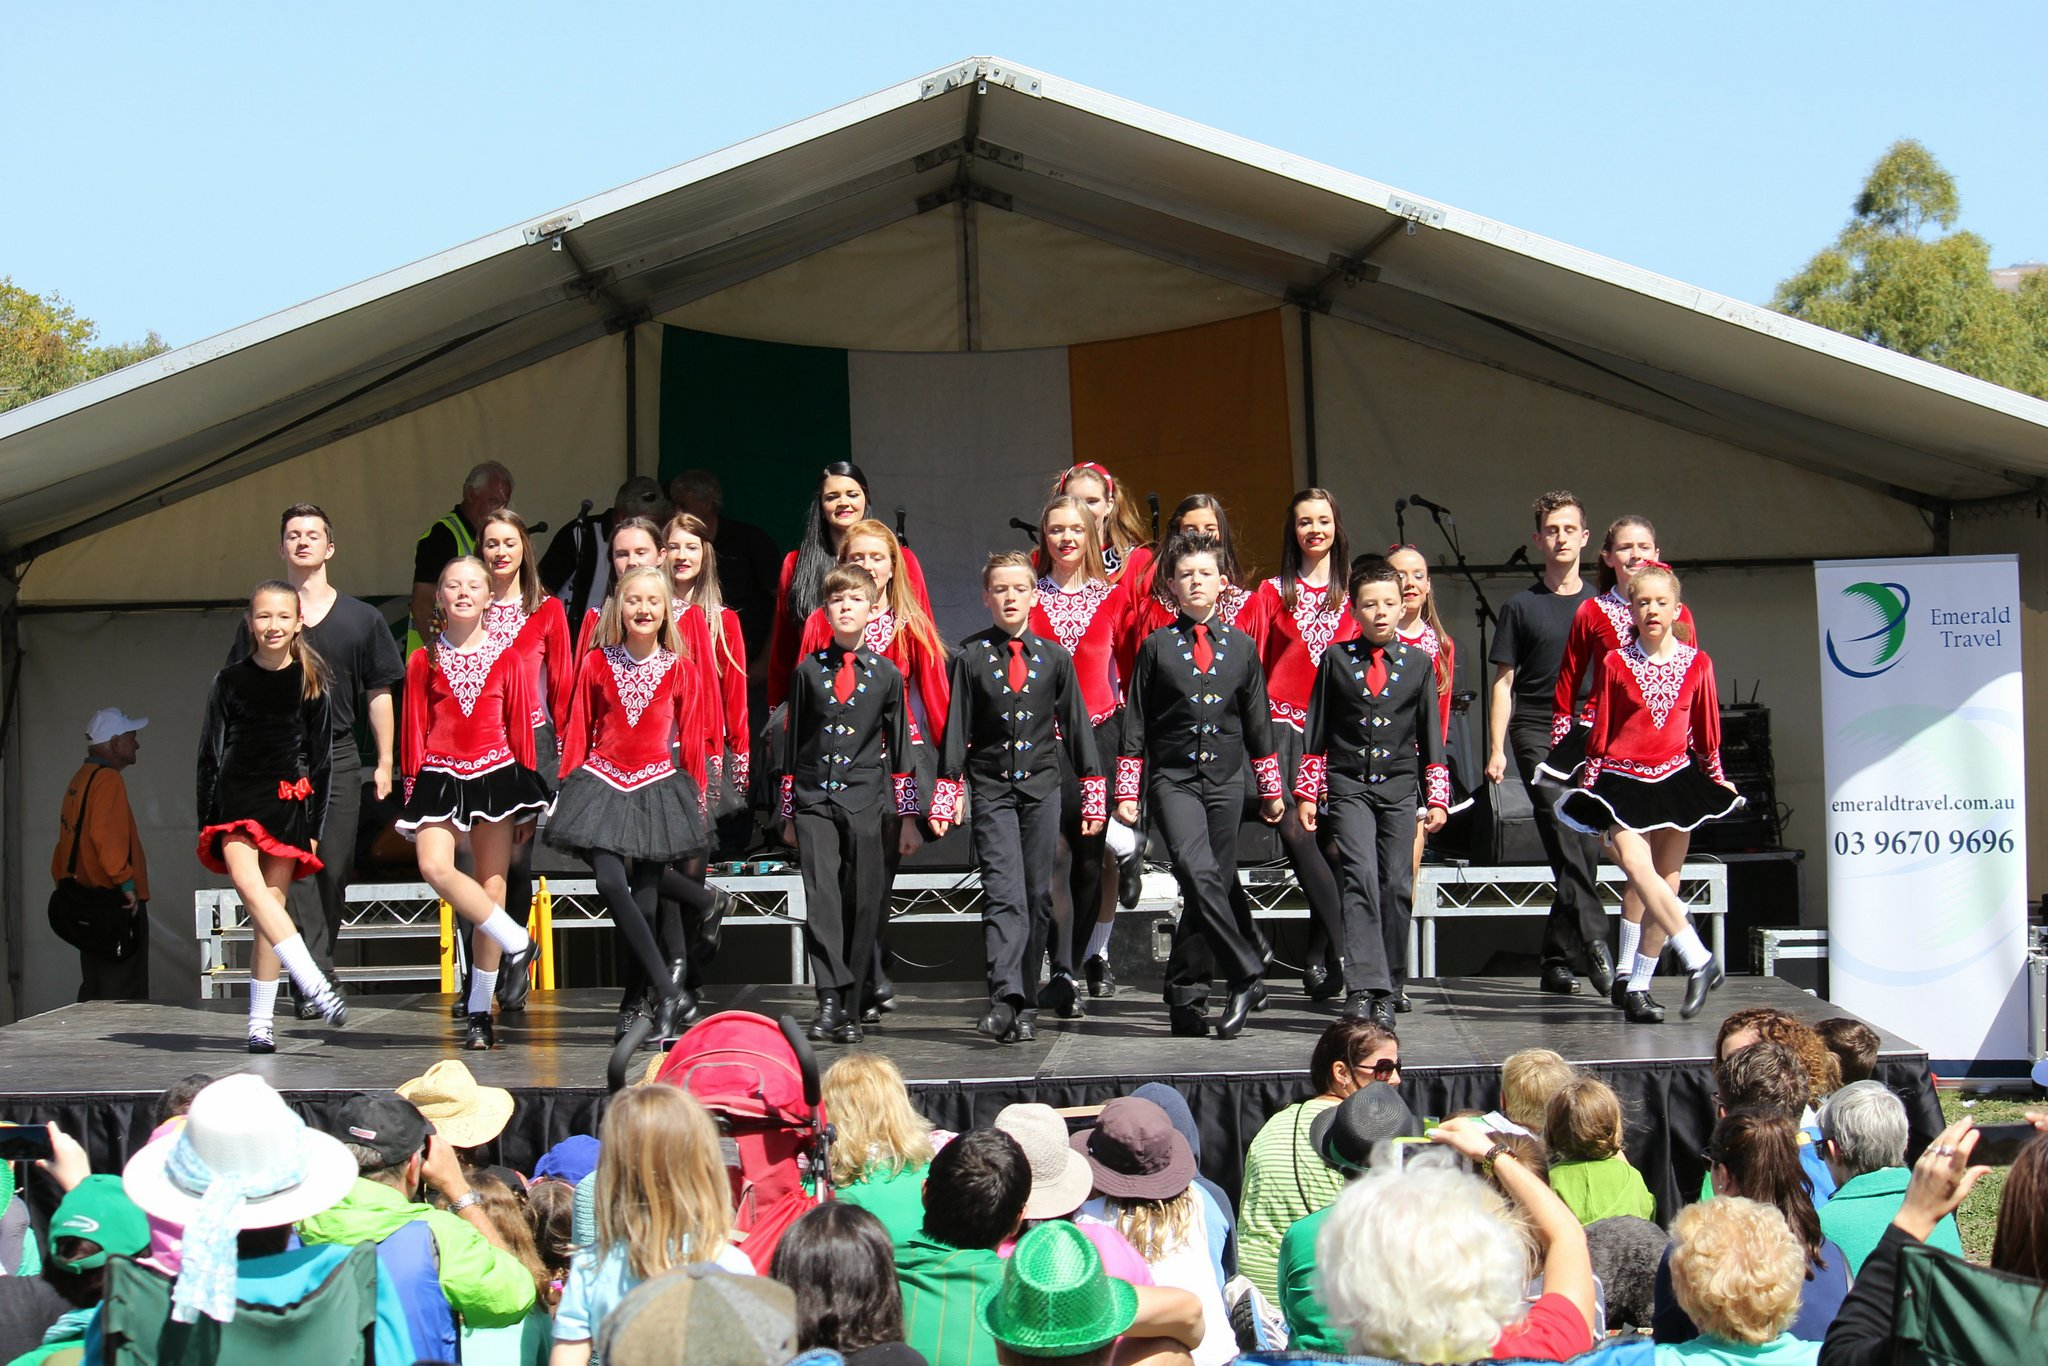 St Patrick's Day Festival 2015